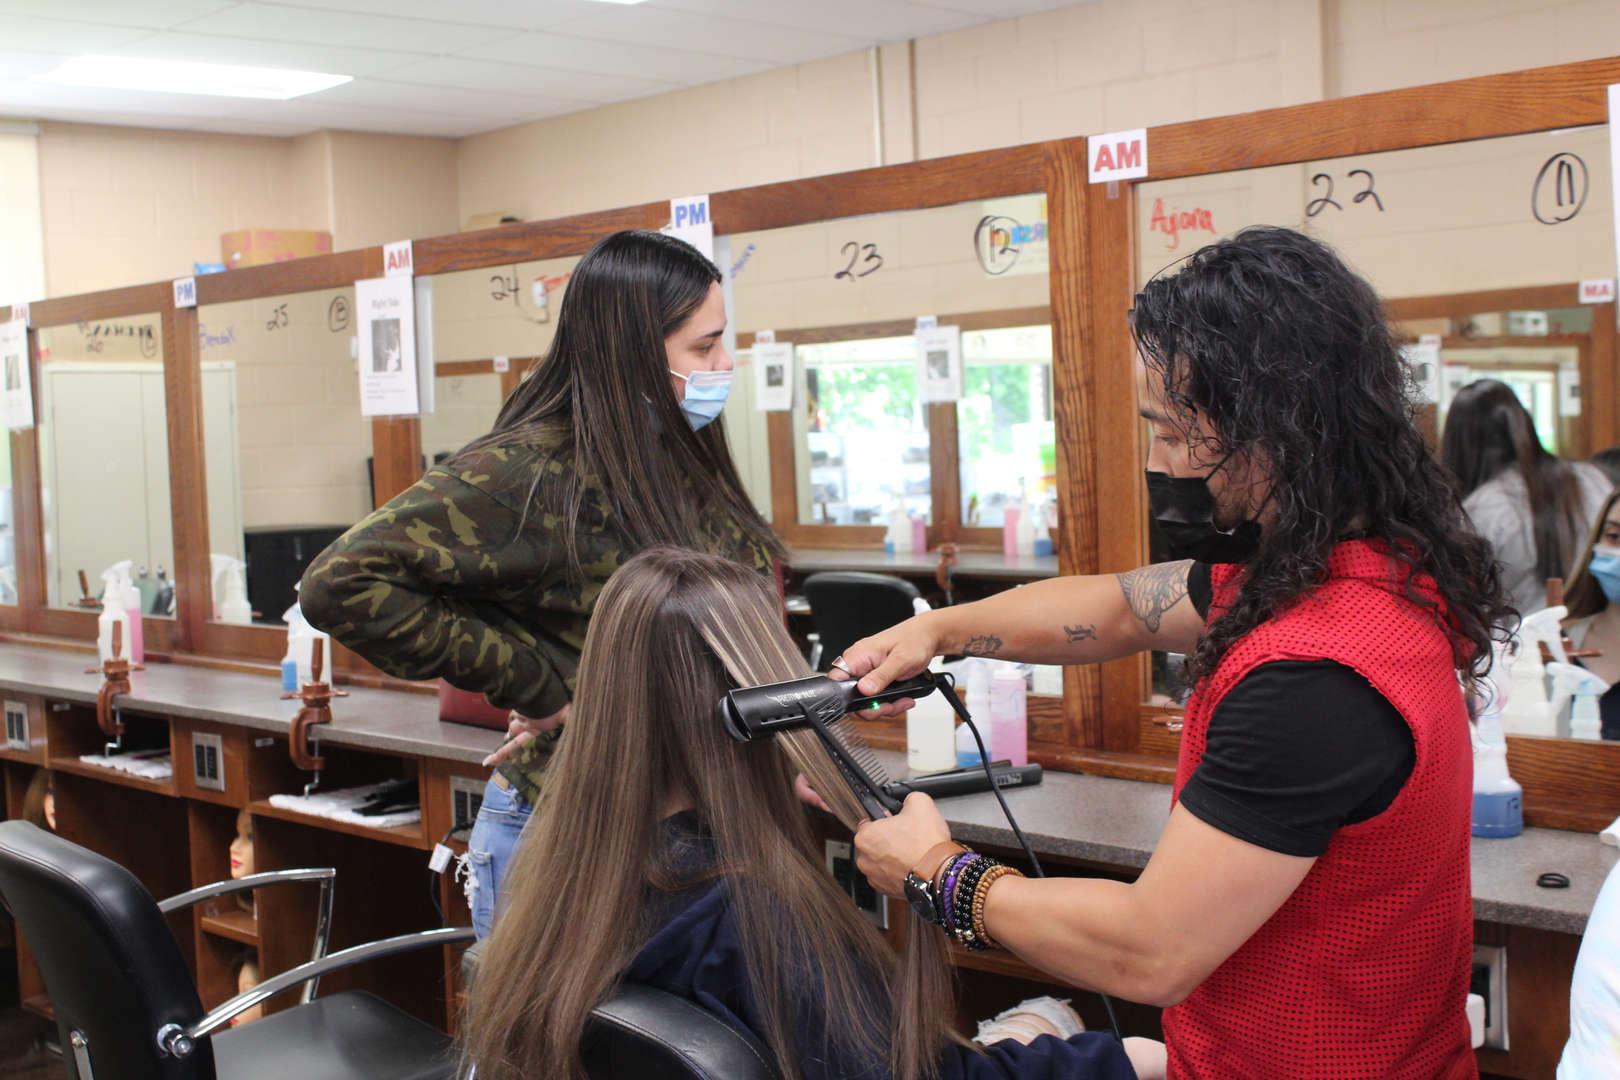 Man uses flatiron tool to straighten hair on girl